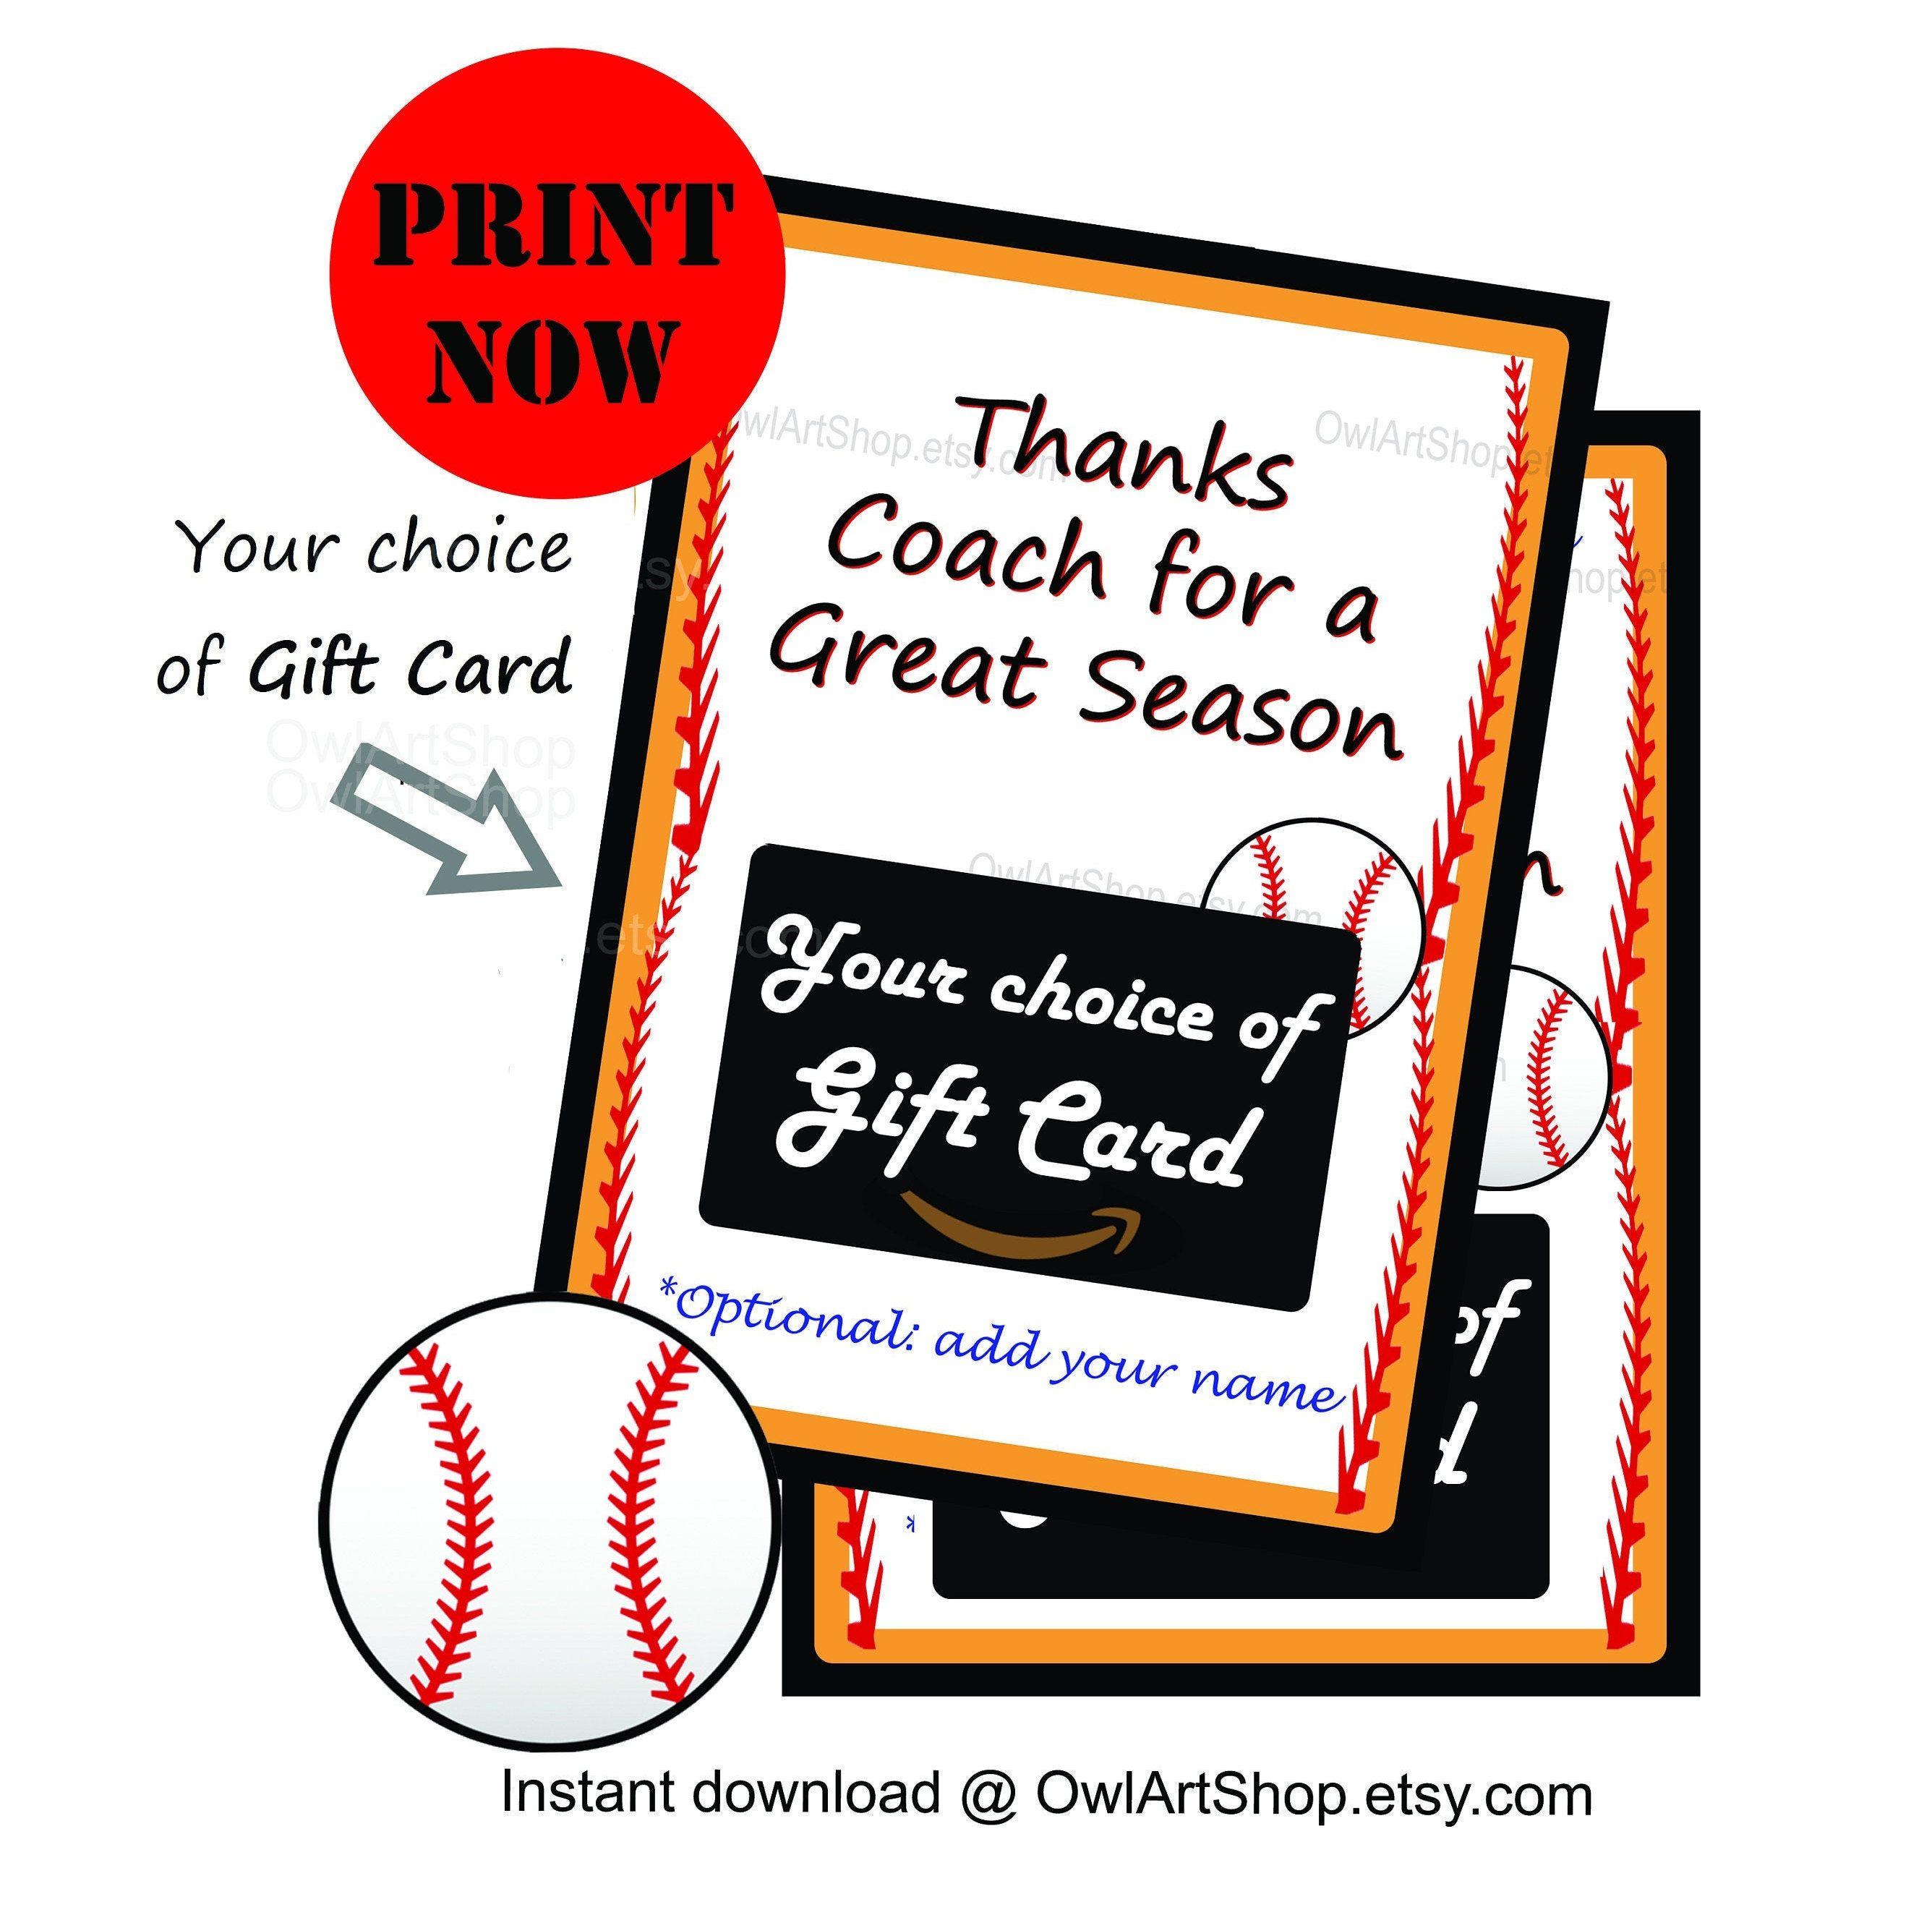 Coach thanks for a great season baseball gift card holder